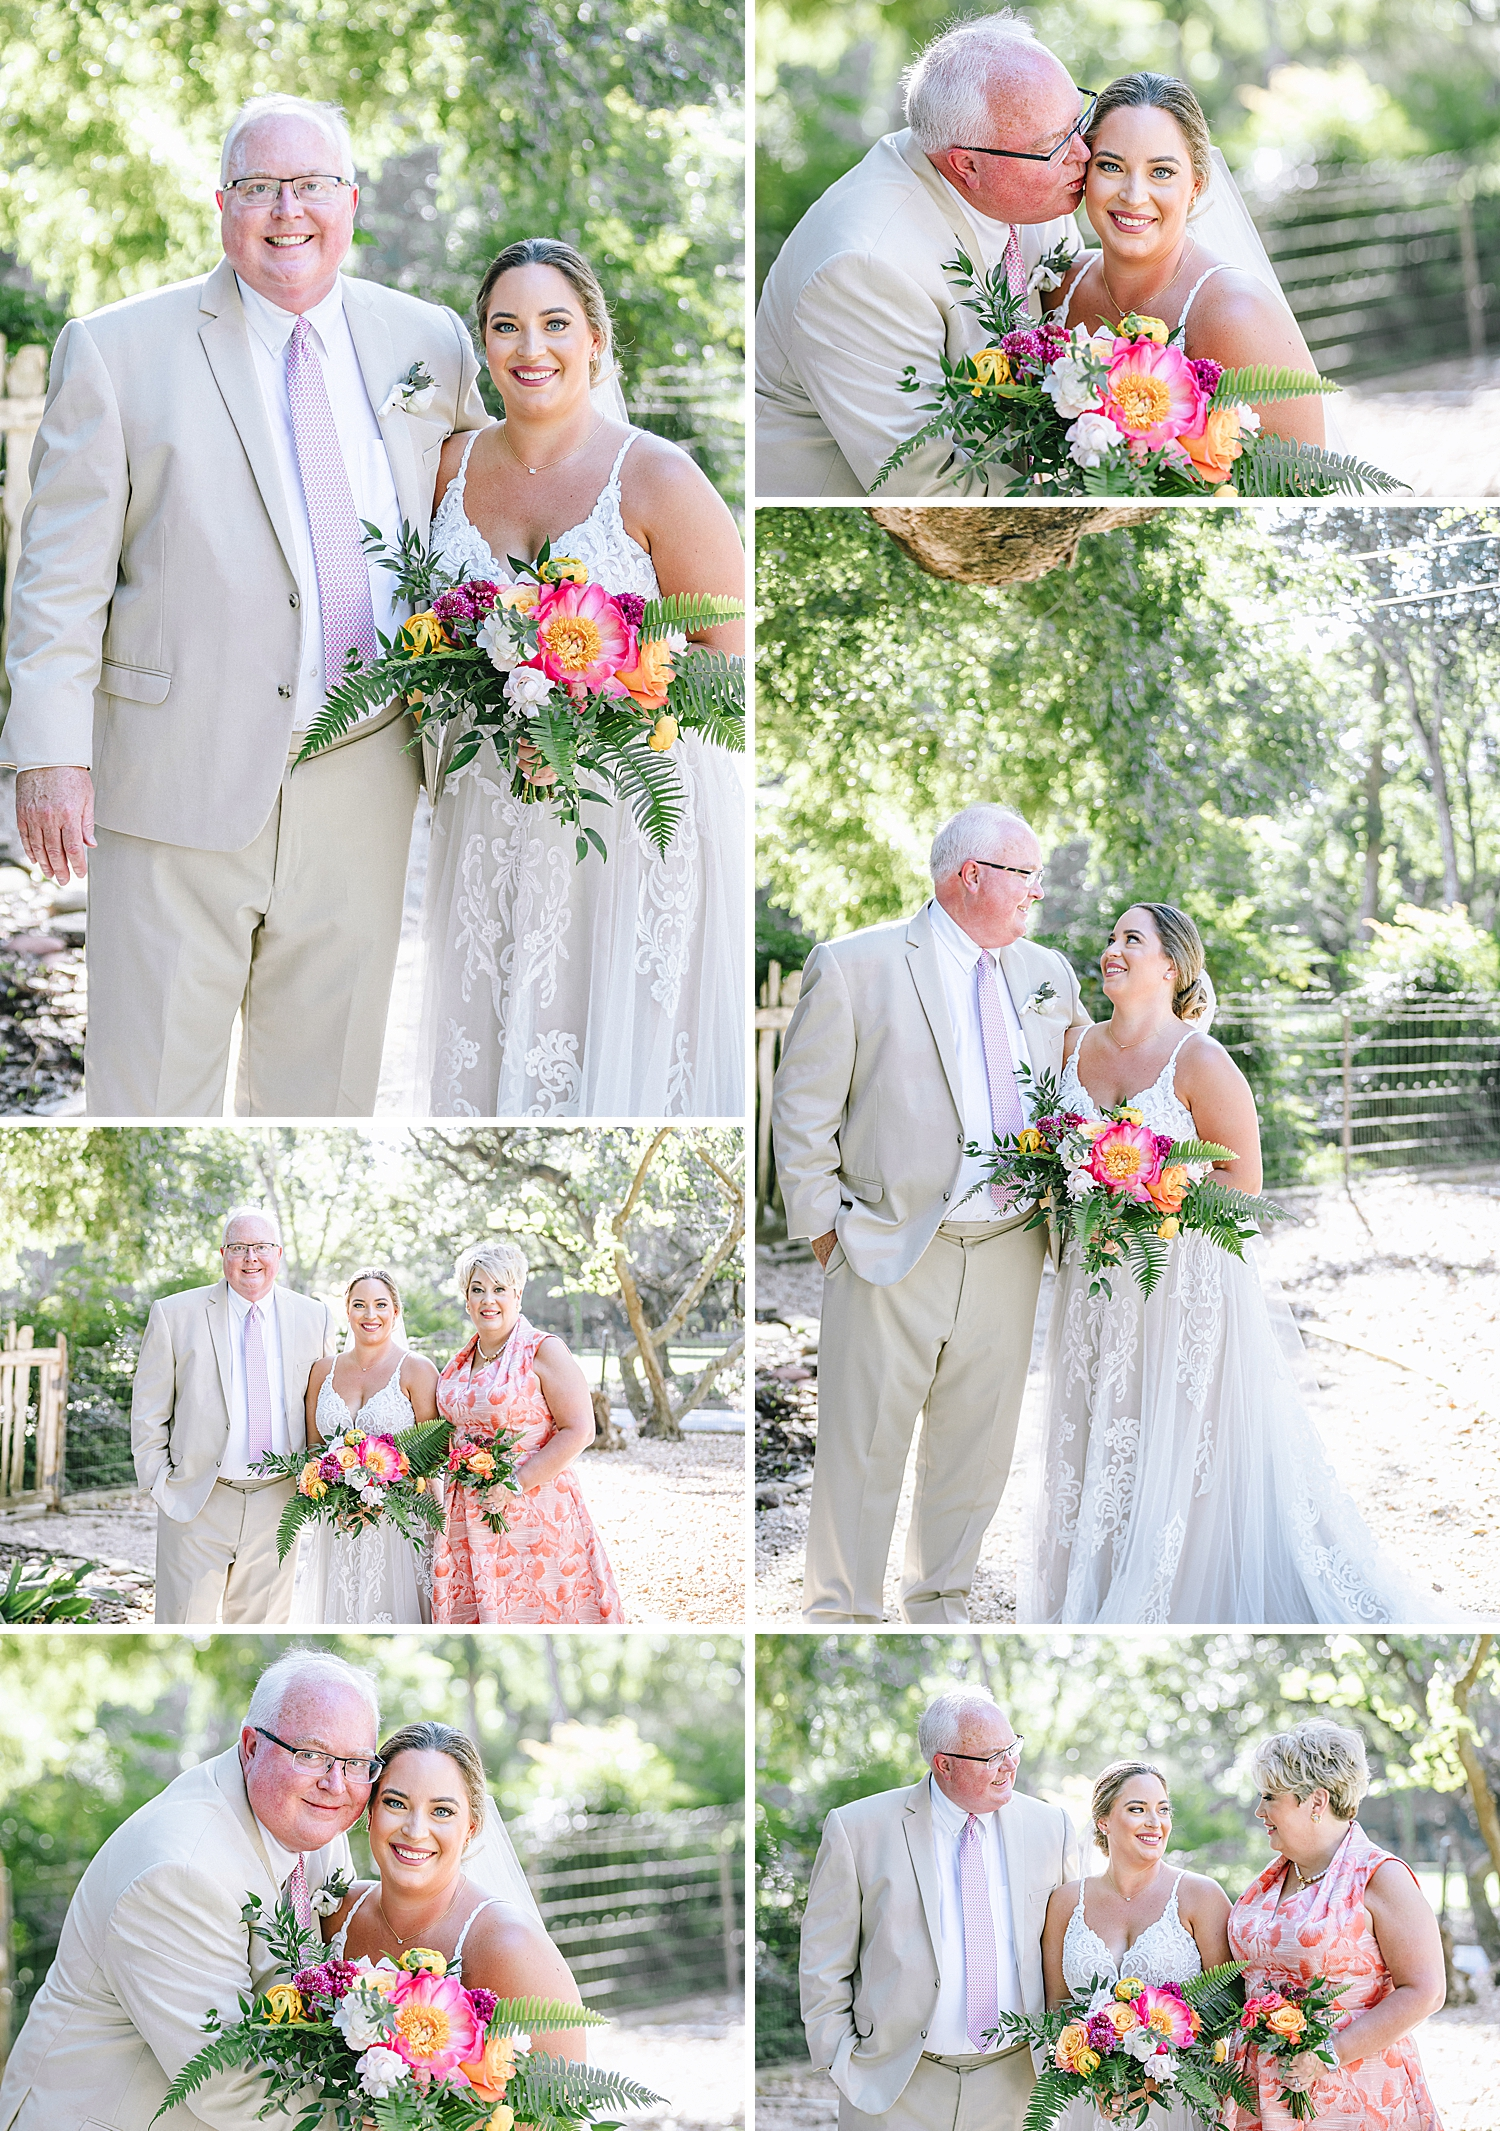 Gruene-Estate-Wedding-New-Braunfels-Bride-Wedding-Photos-Carly-Barton-Photography_0092.jpg